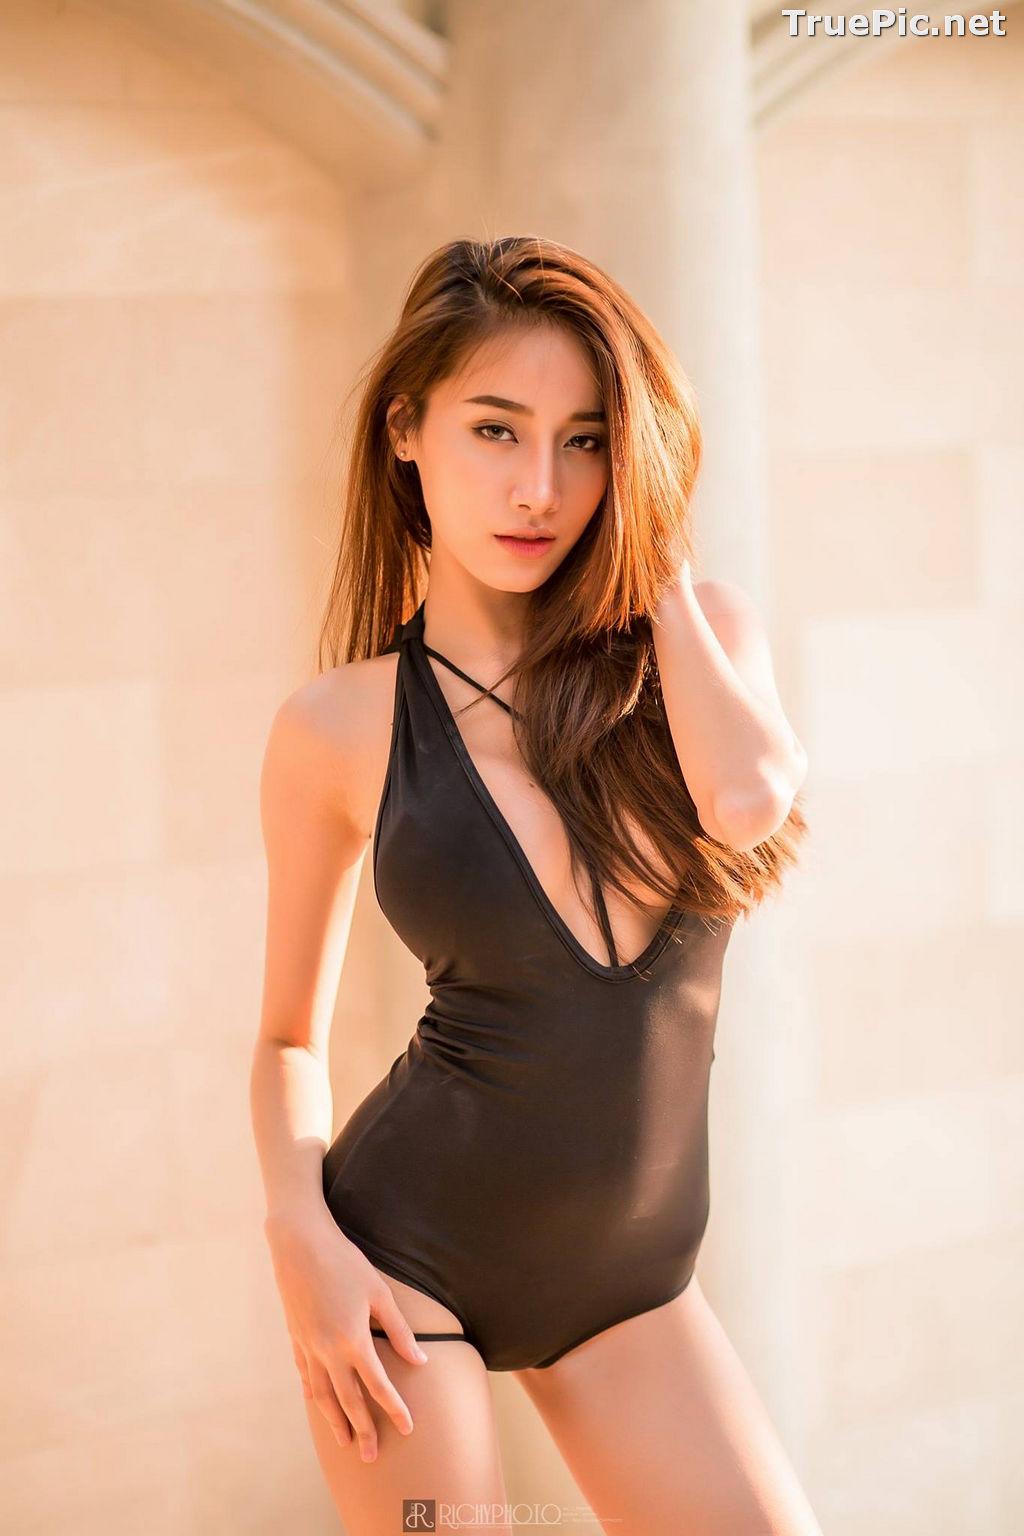 Image Thailand Model - Pichana Yoosuk - Black One Piece Swimsuit - TruePic.net - Picture-1